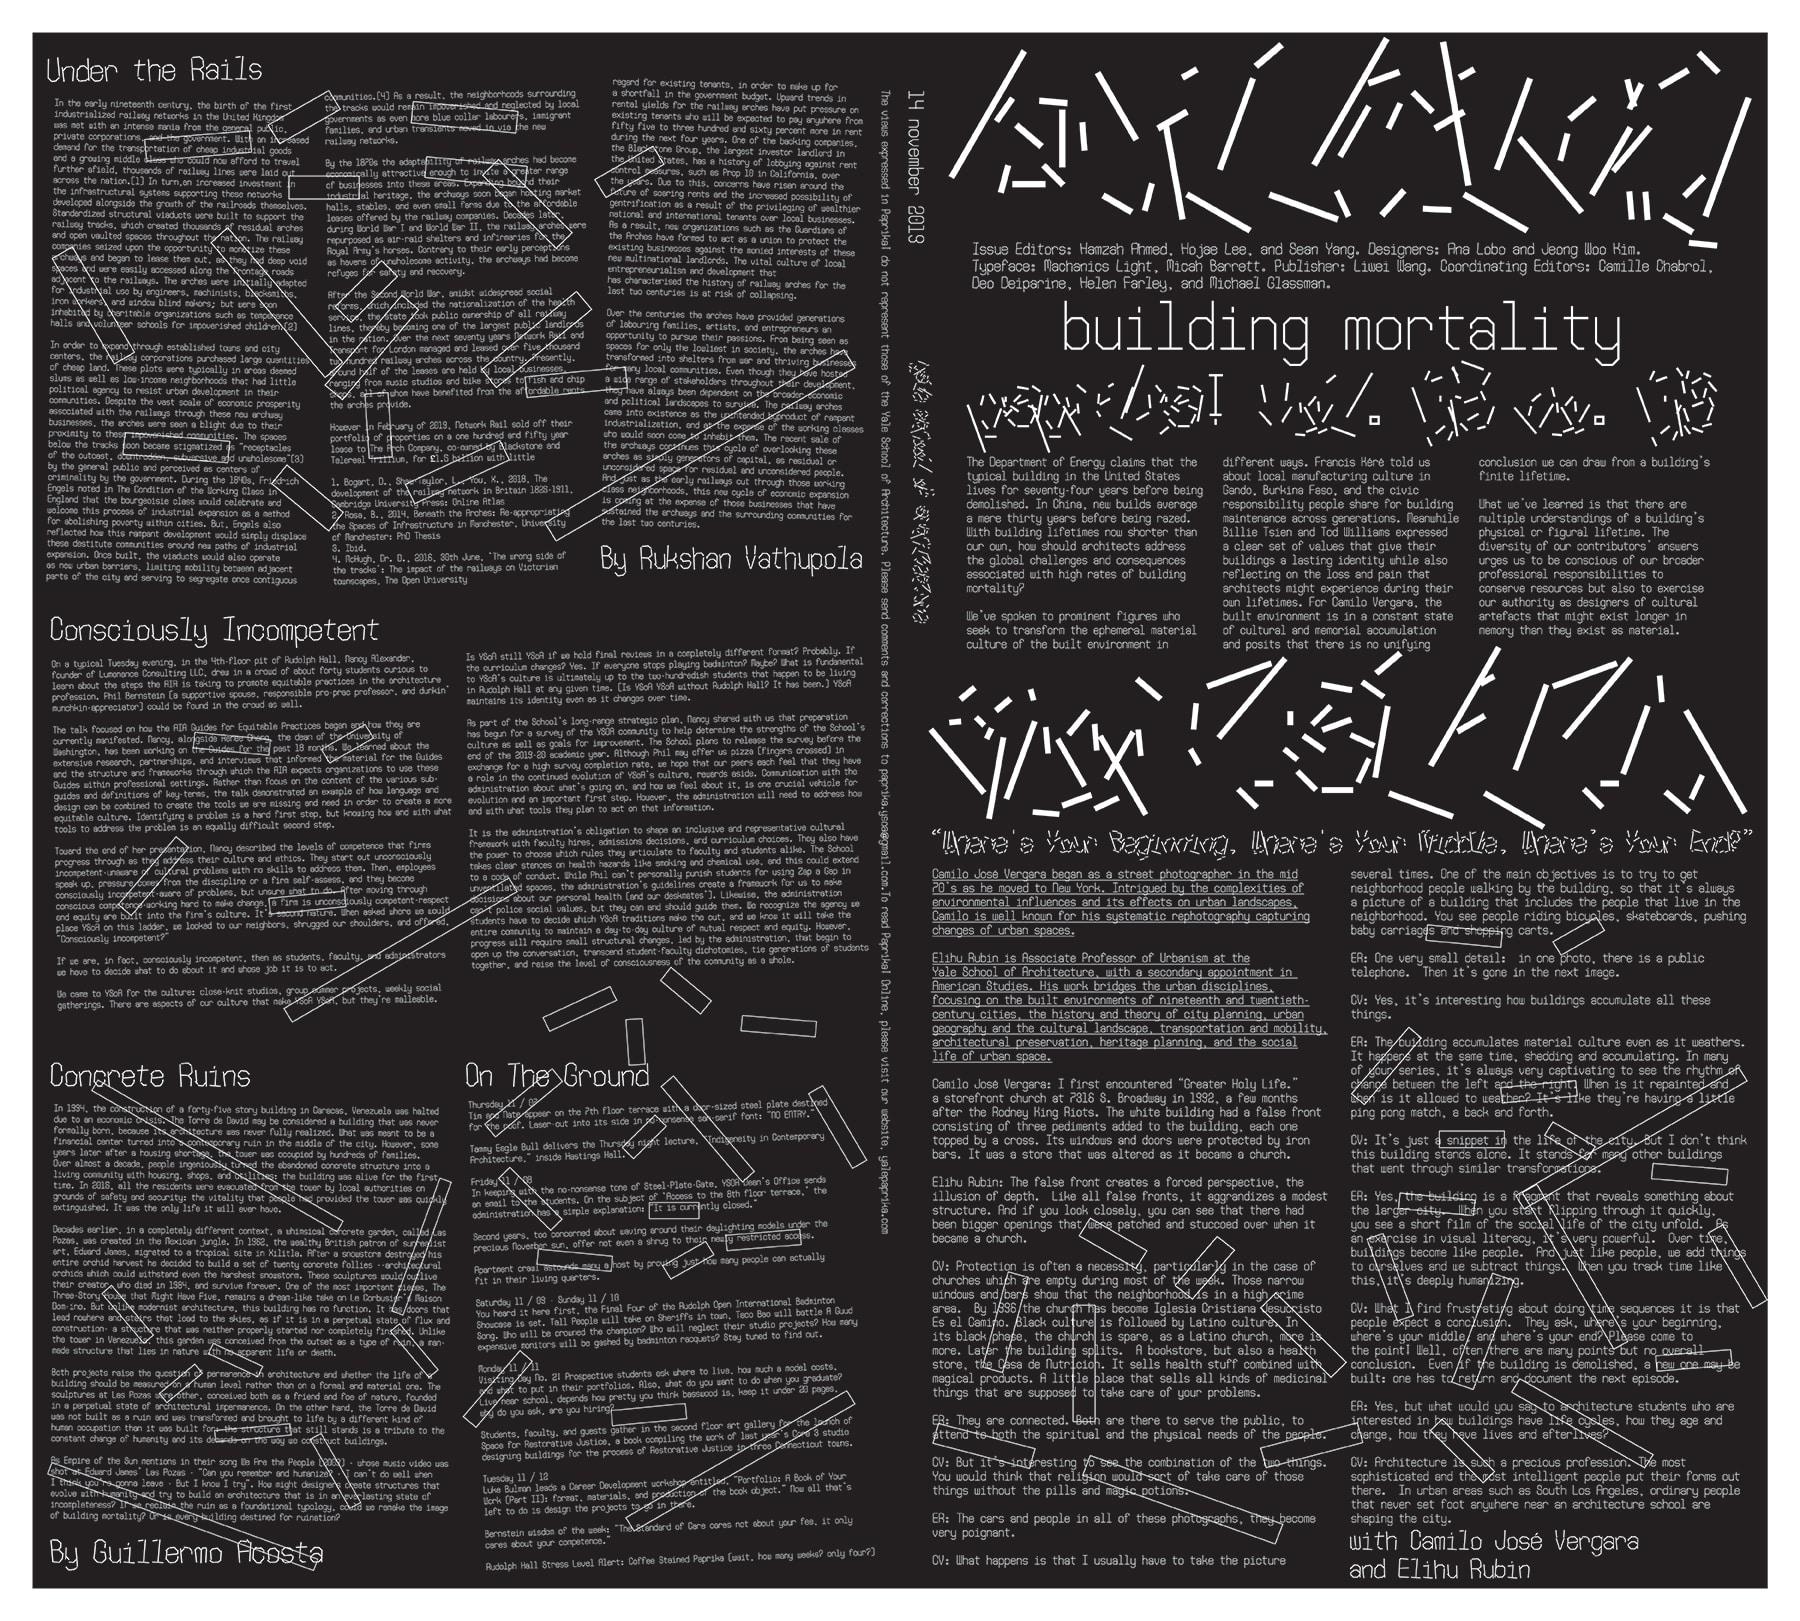 5-08 Building Mortality